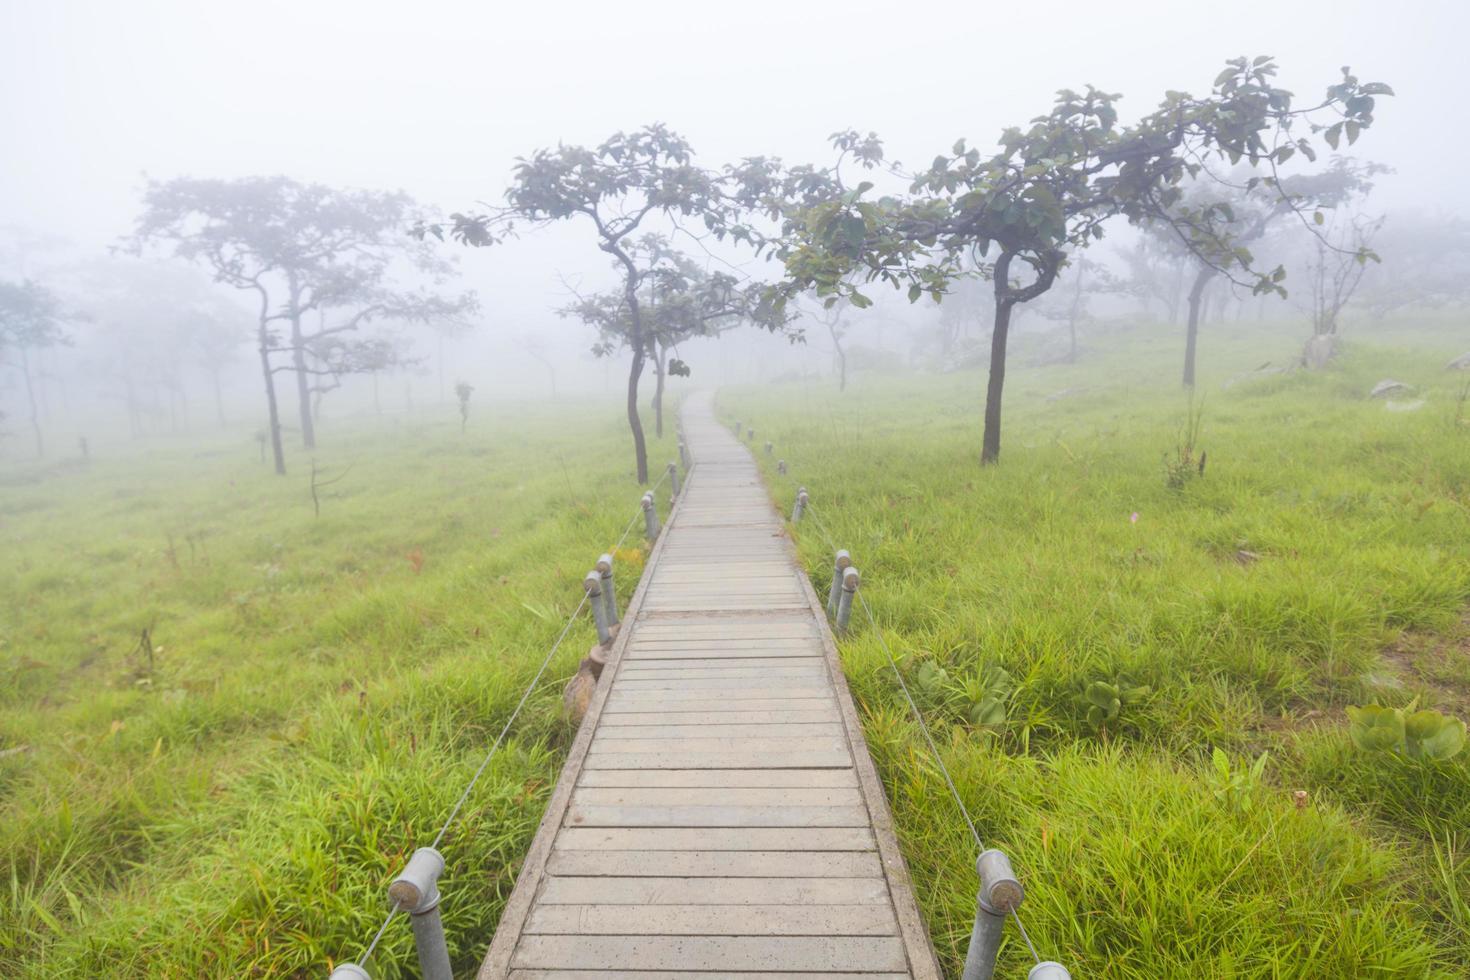 Holzsteg im Wald foto